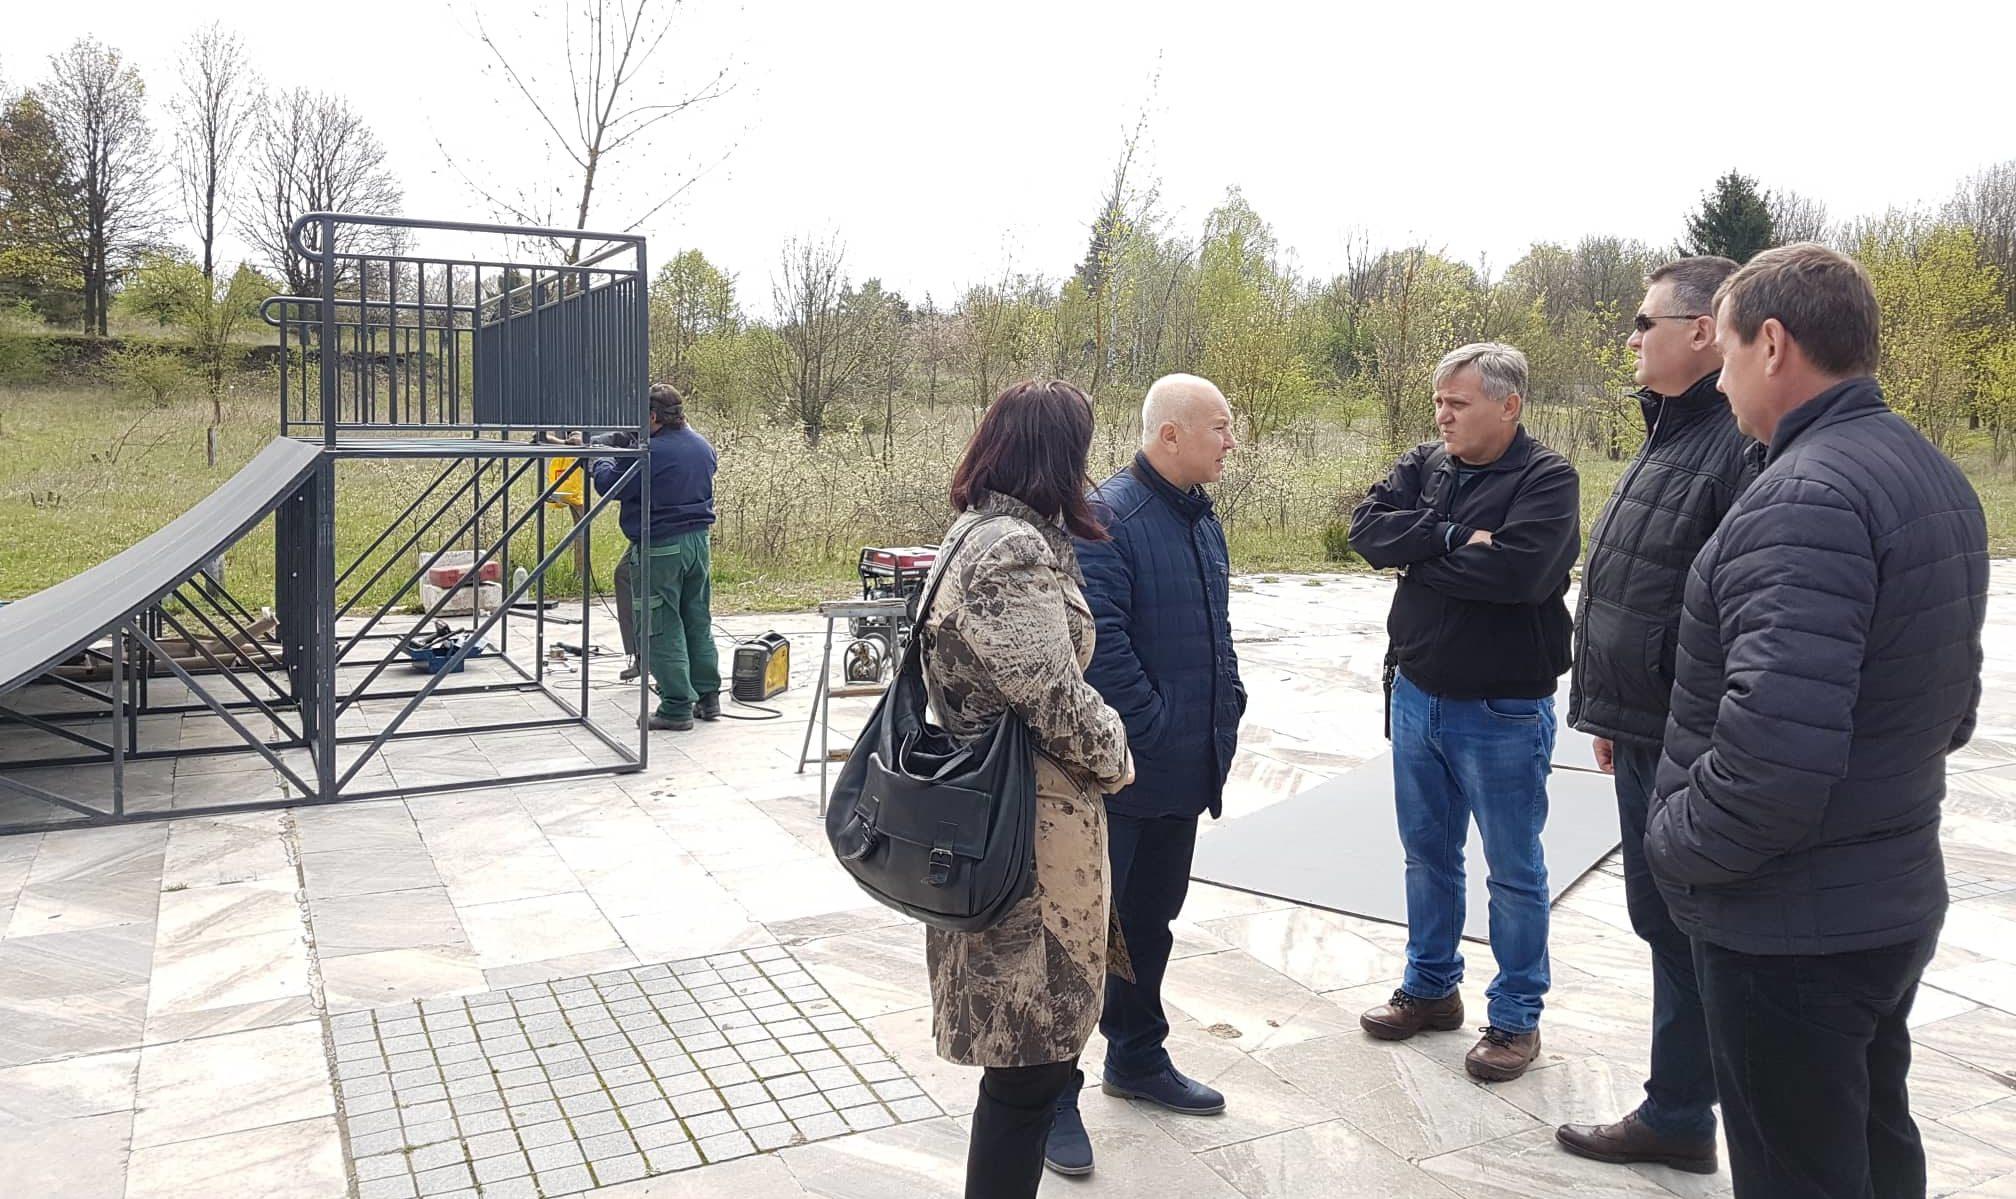 Нова скейтборд рампа за 8 982 лв. постави Община Разград � ...